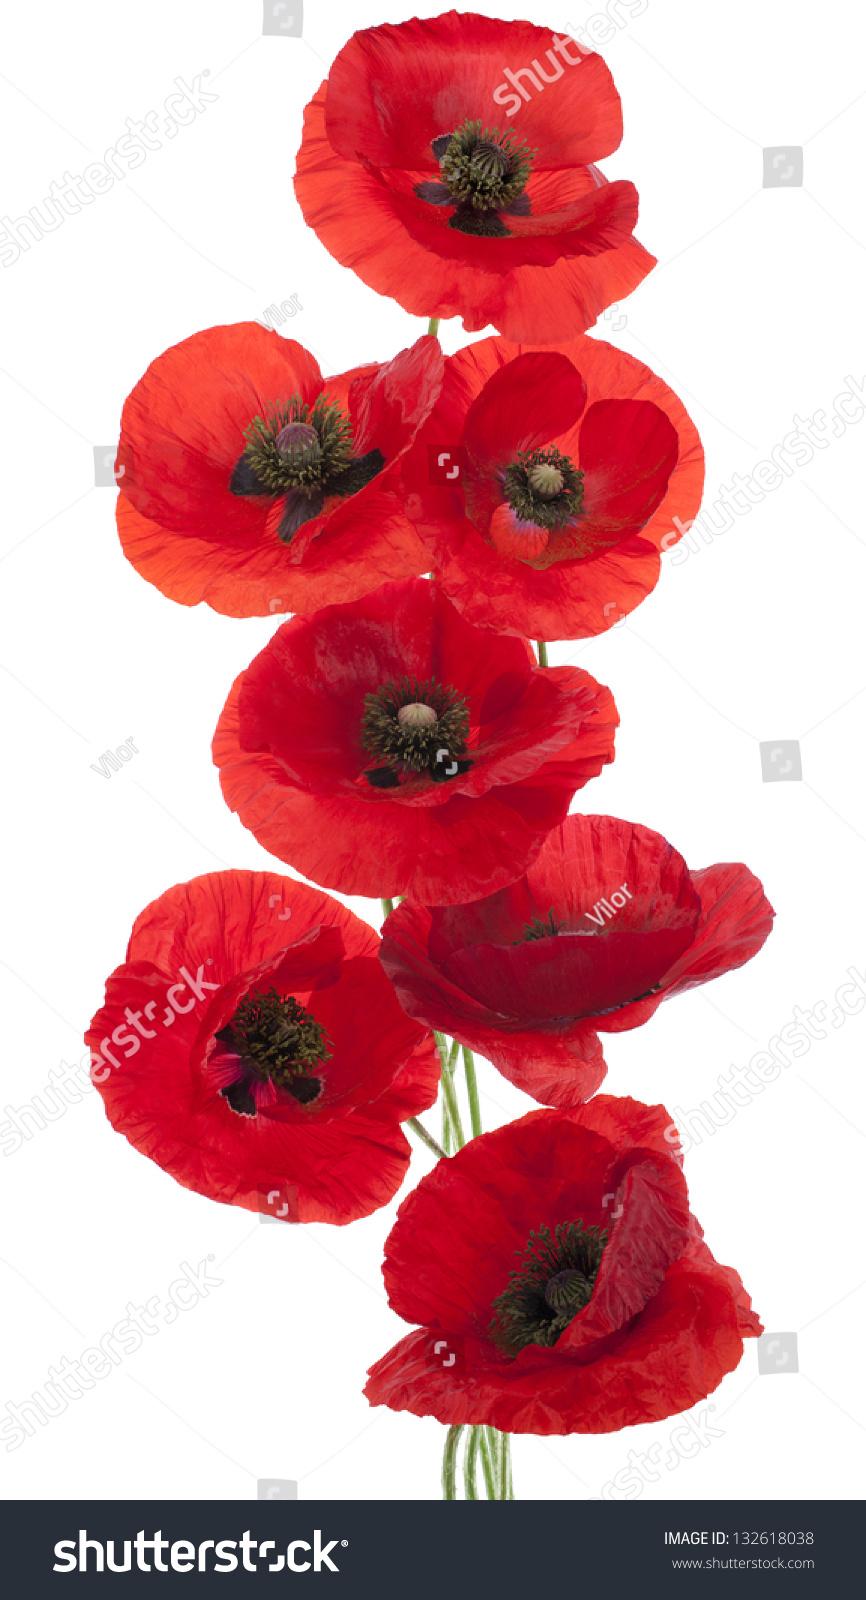 Studio Shot Red Colored Poppy Flowers Stock Photo ...